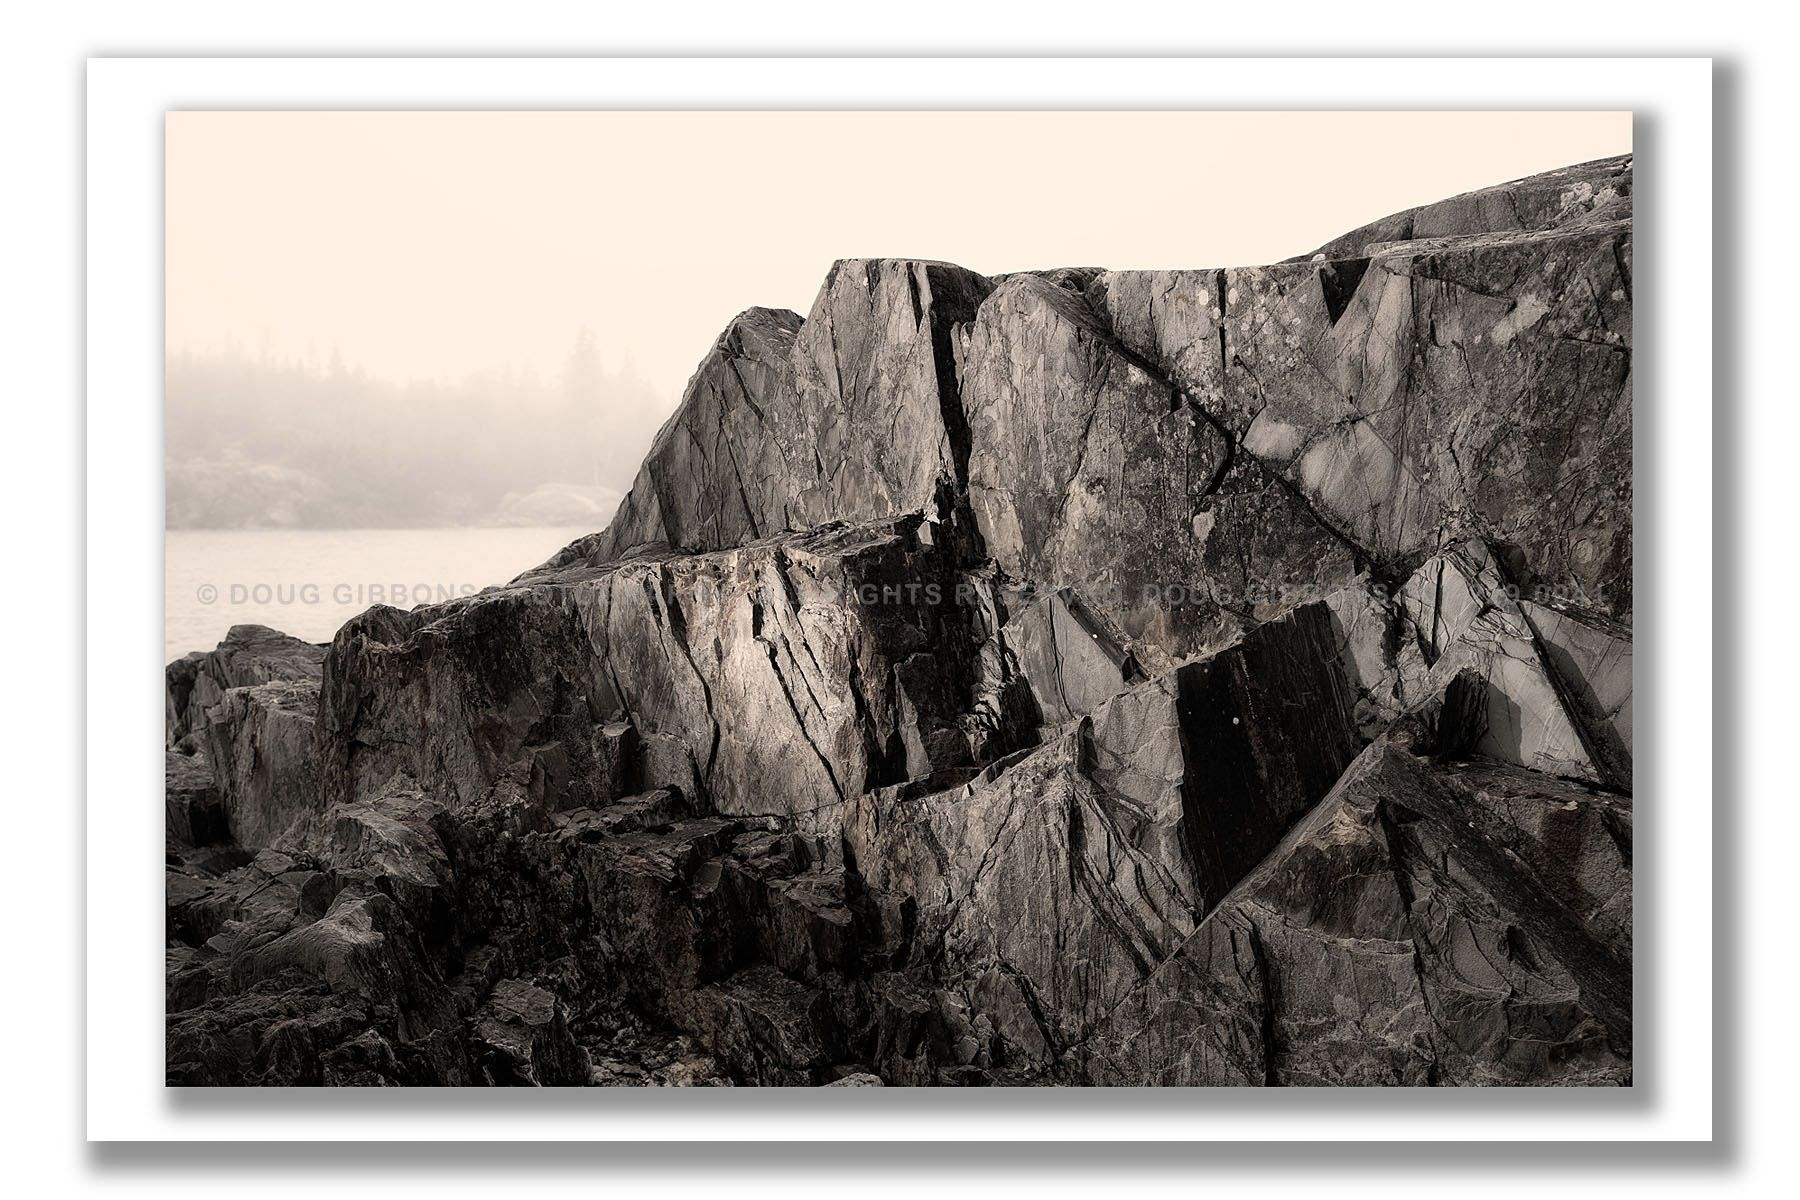 Edge of Pukaskwa